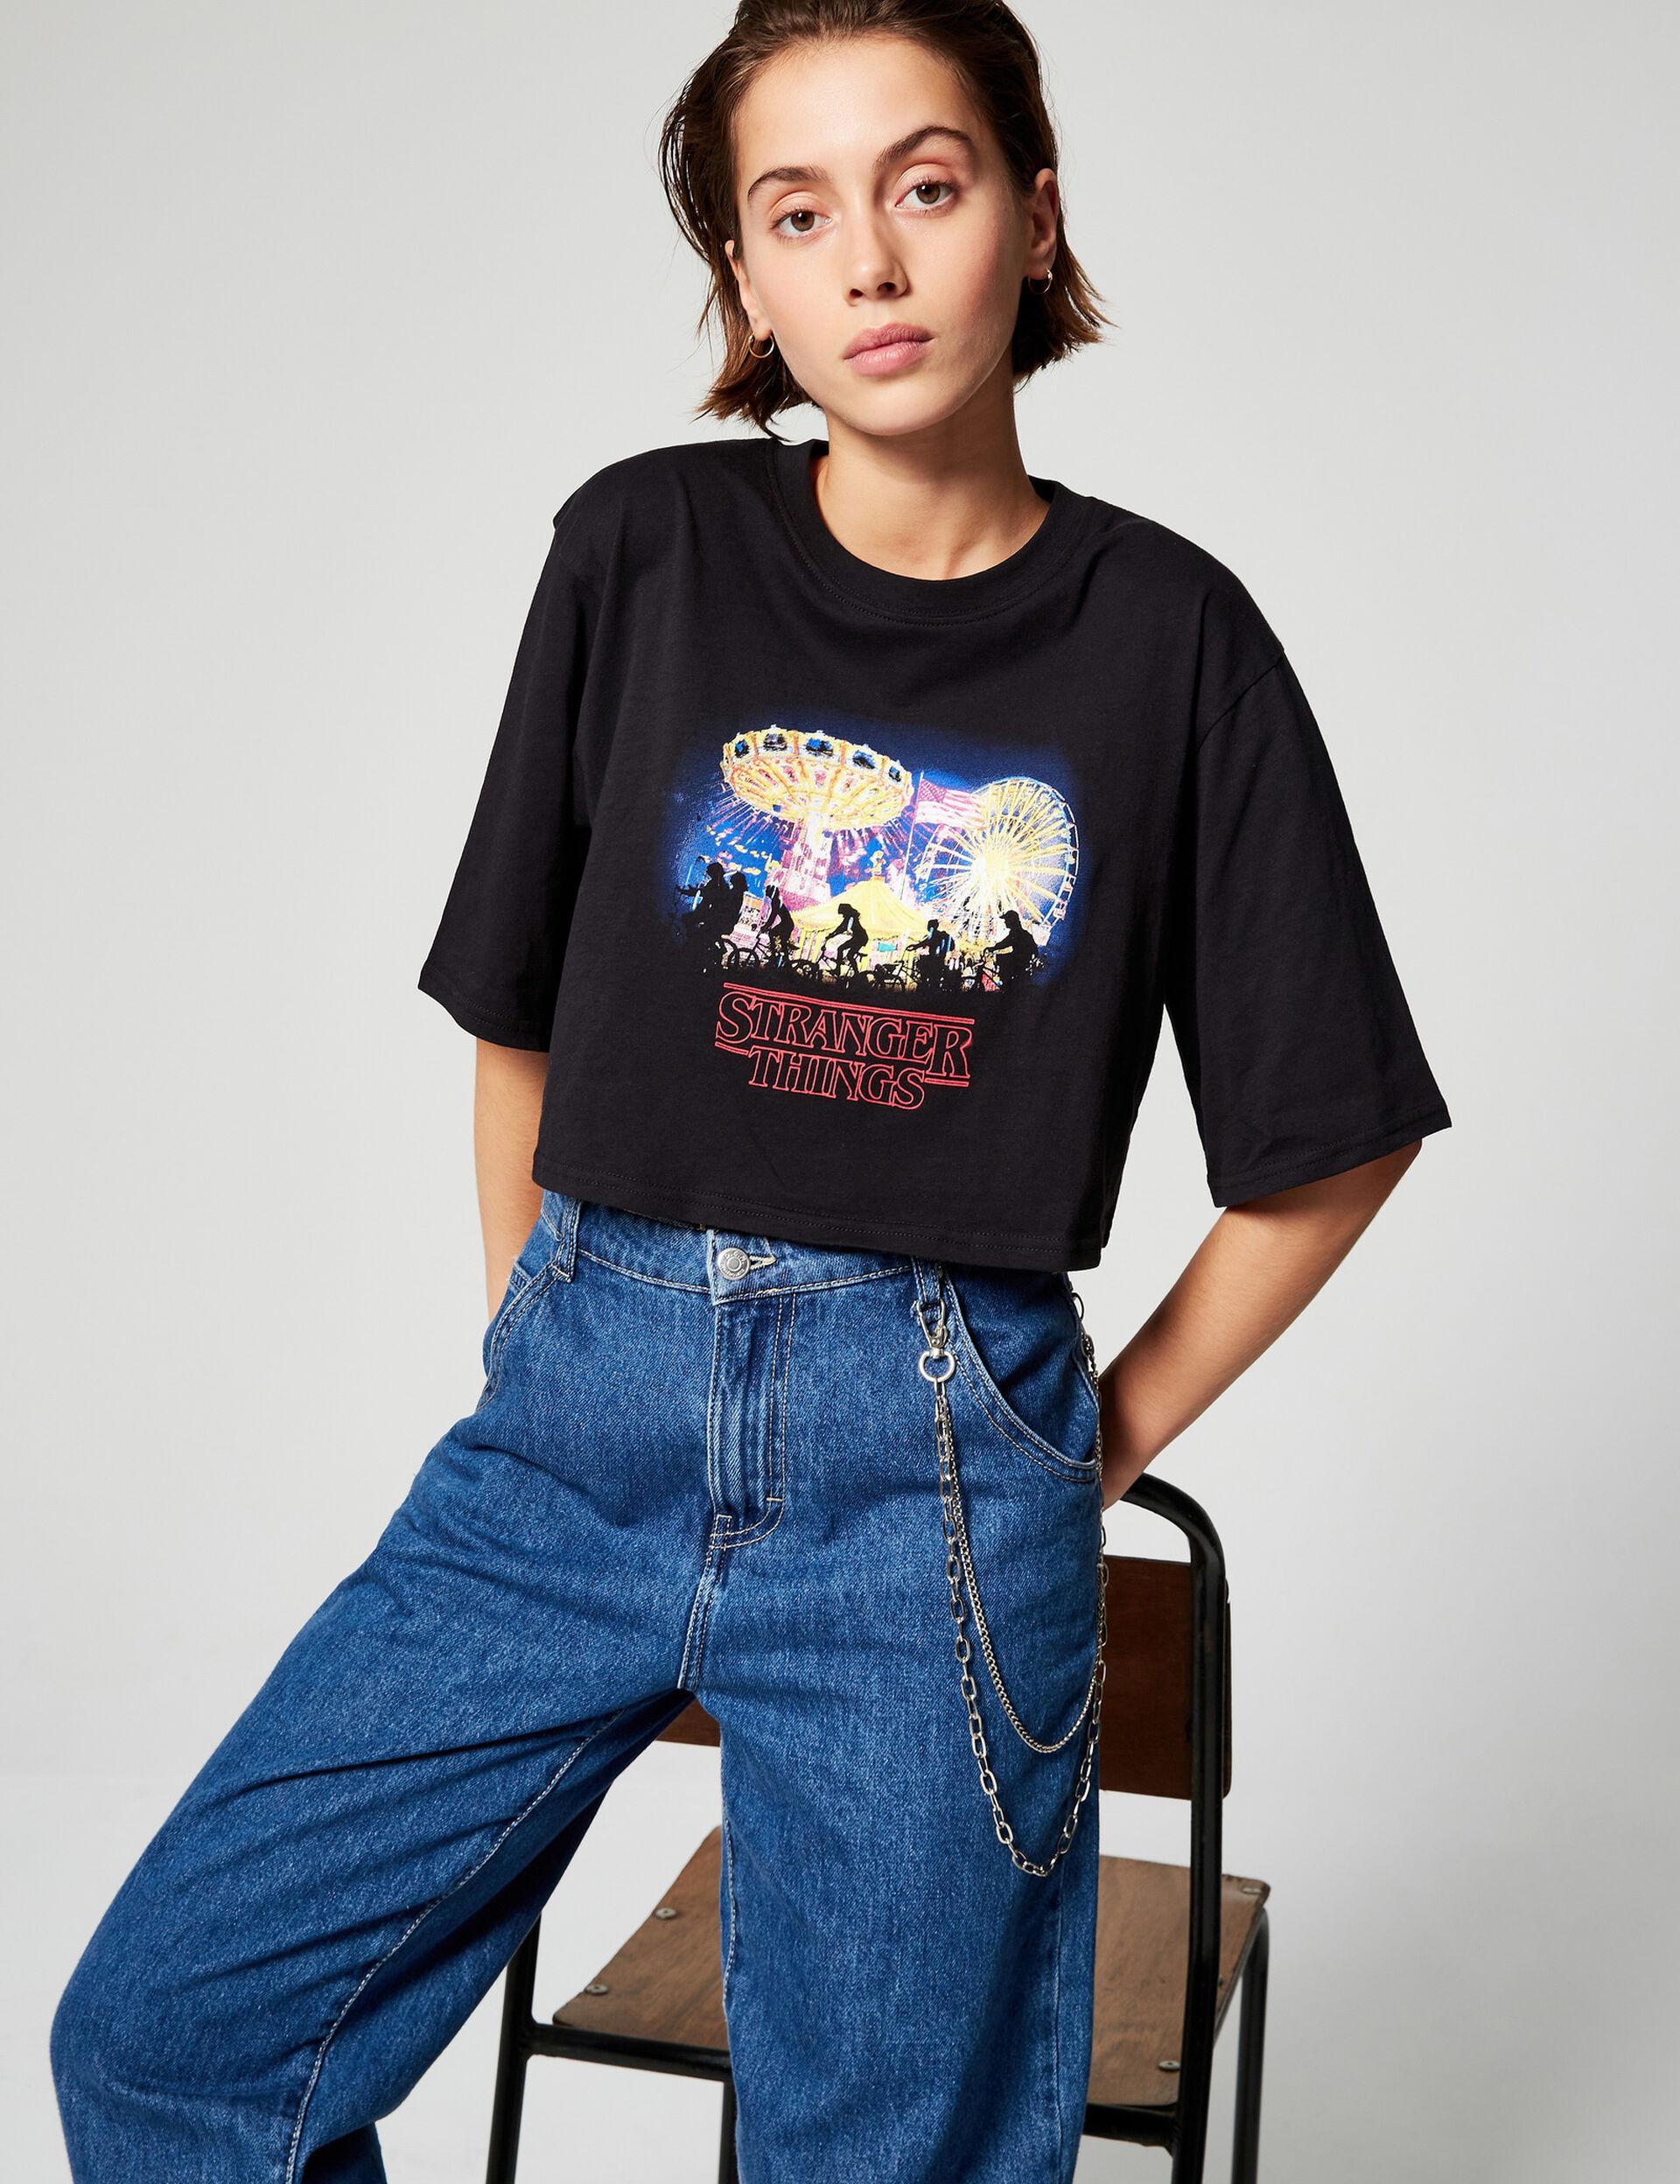 Tee-shirt court Stranger Things